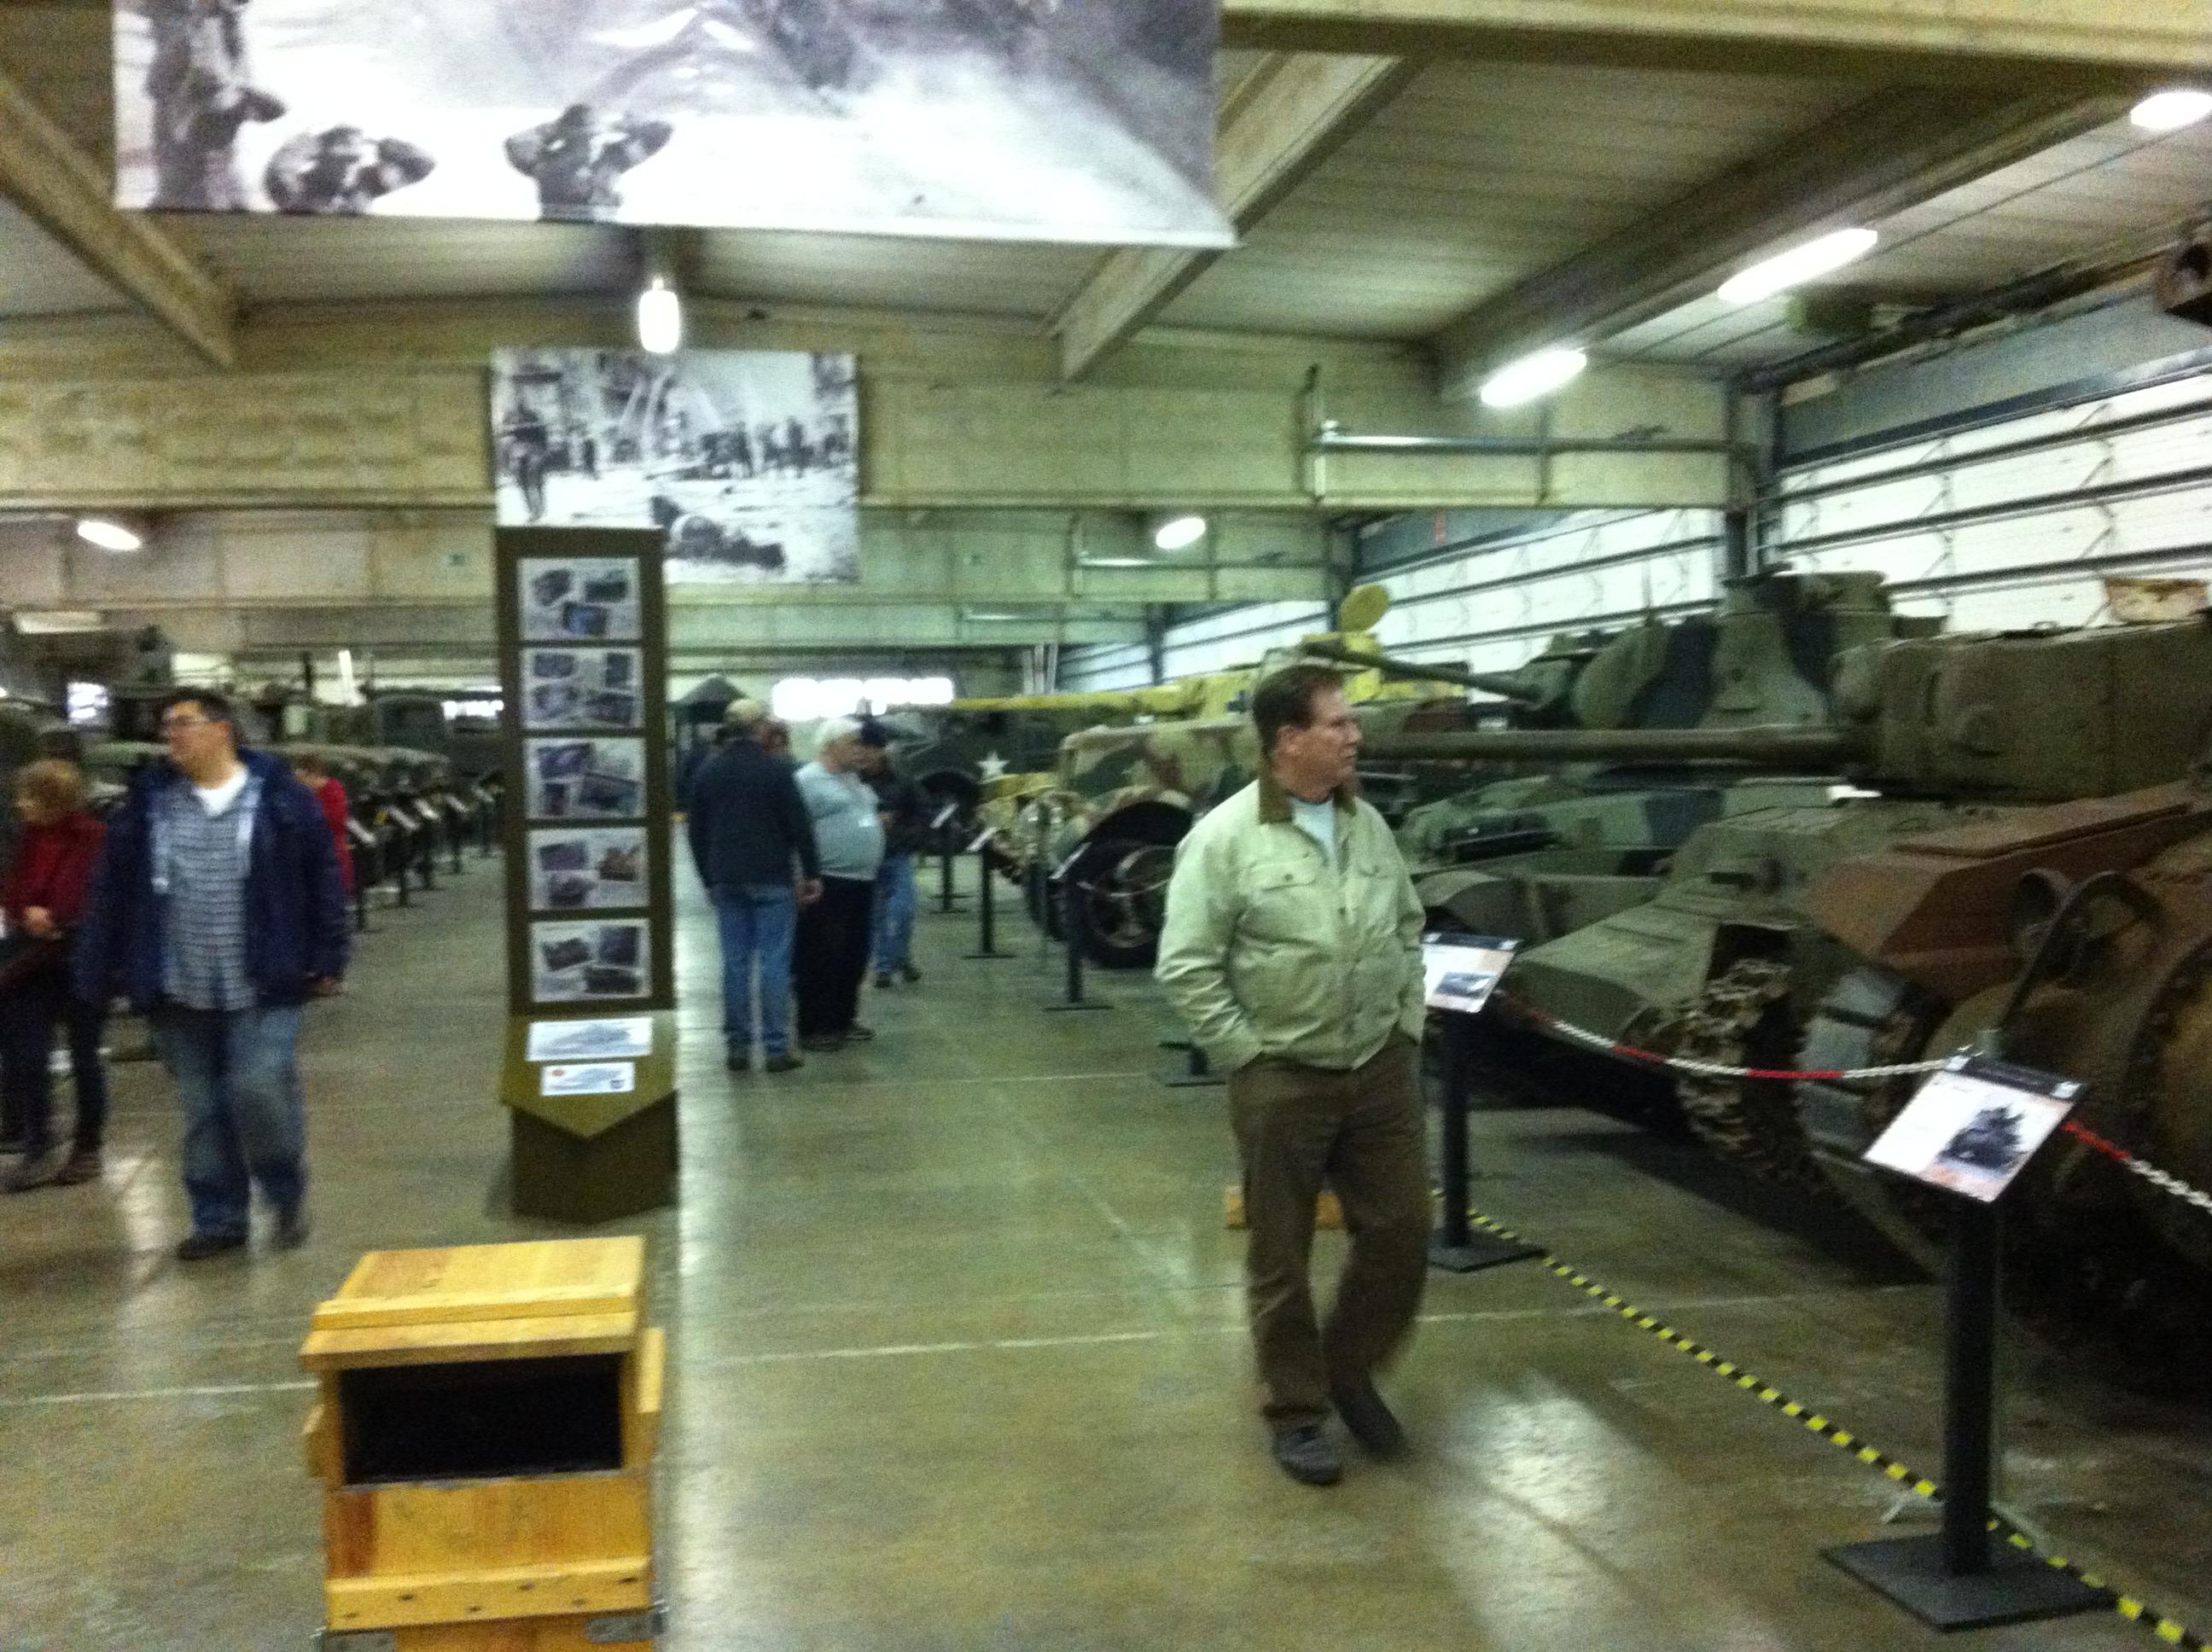 Armor at Bastogne